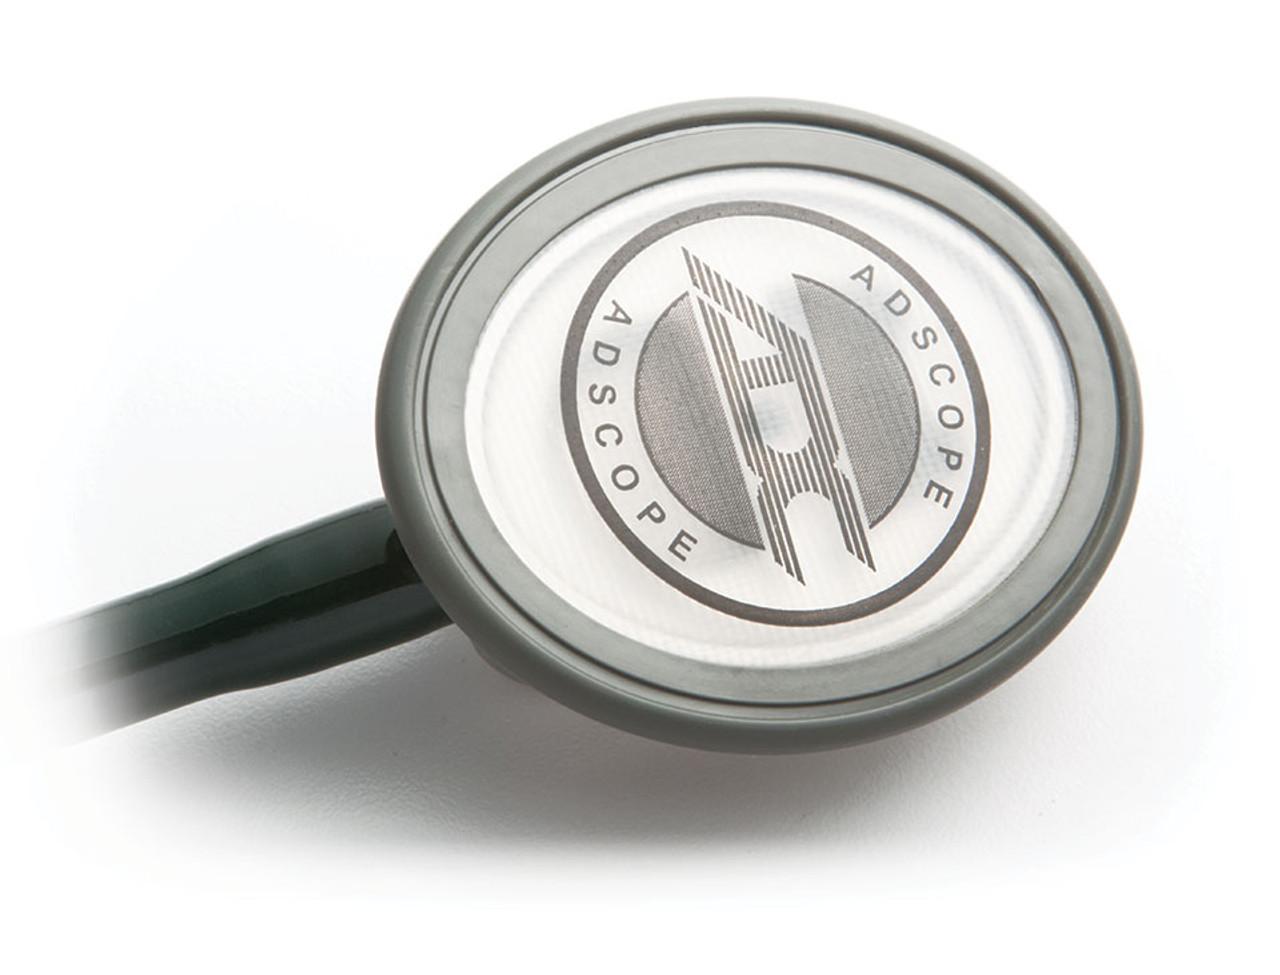 ADC 600 Single Head Advanced Diagnostic Stethoscope, Dark Green, 600DG